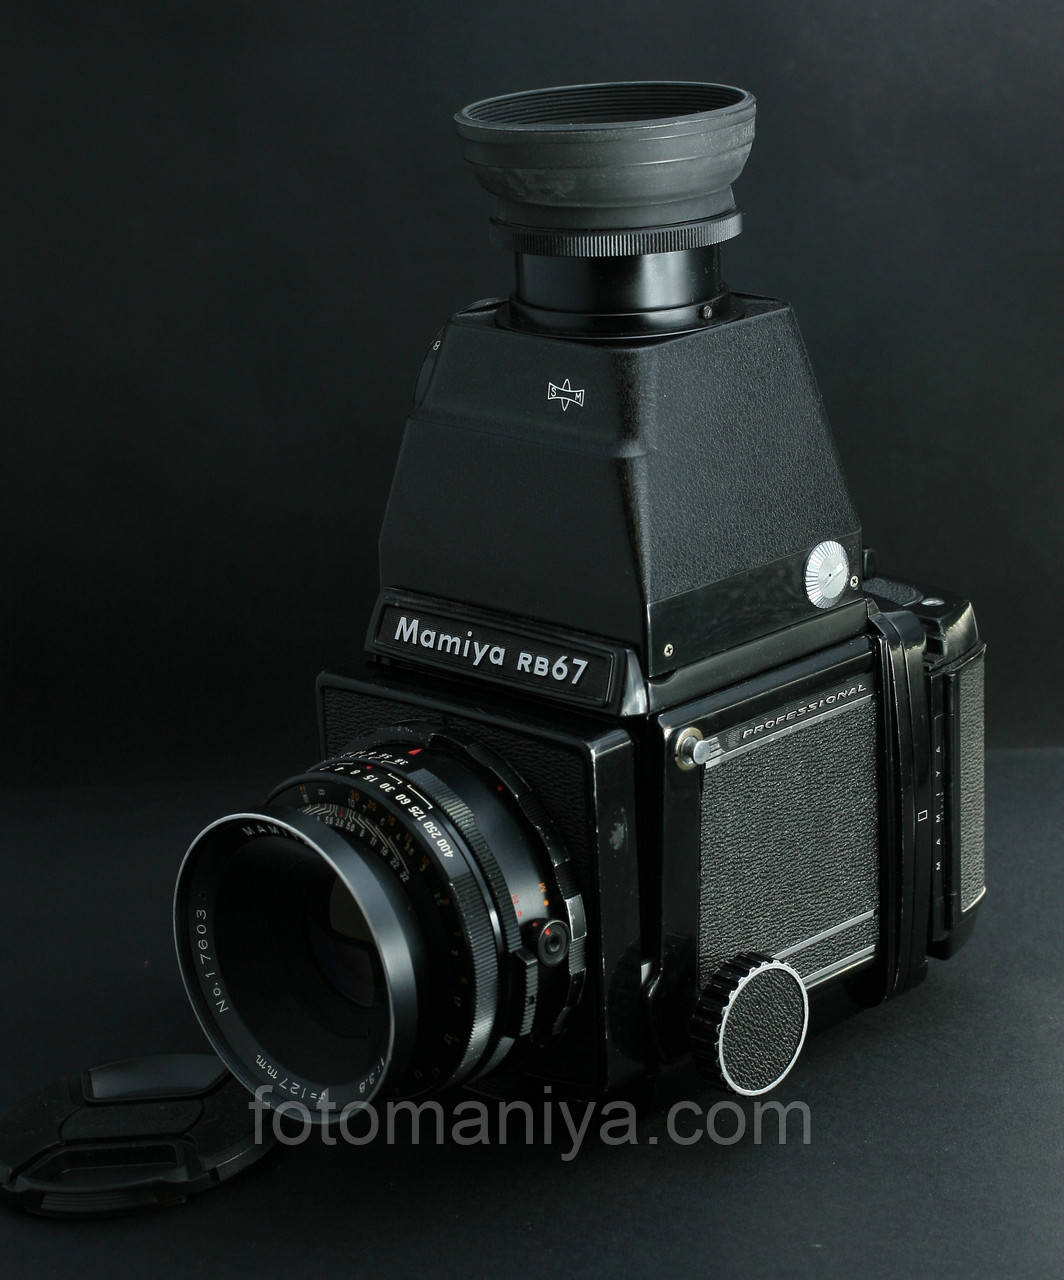 Mamiya RB67 kit Mamiya Sekor 127mm f3.8